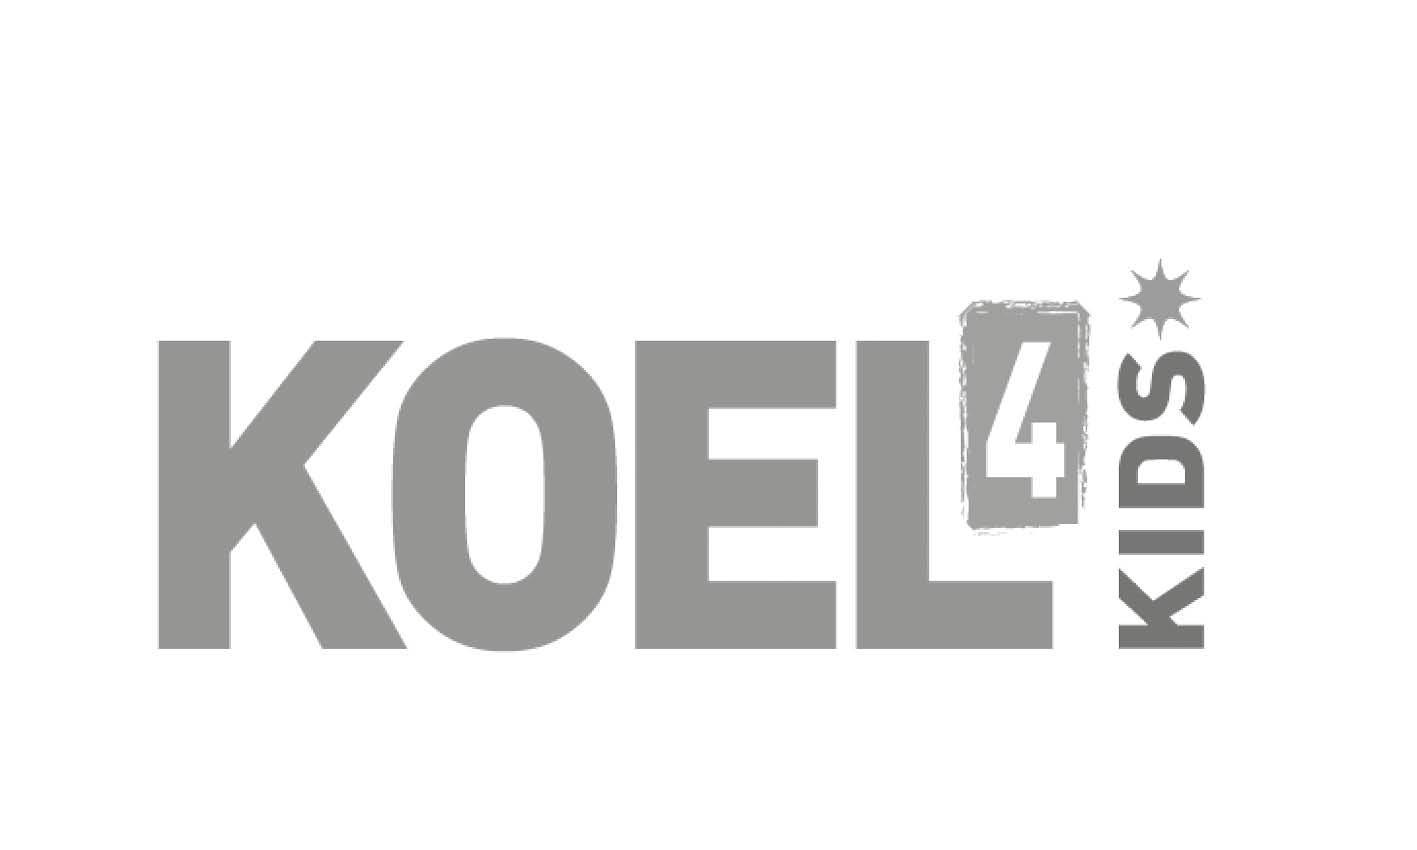 Koel4Kids